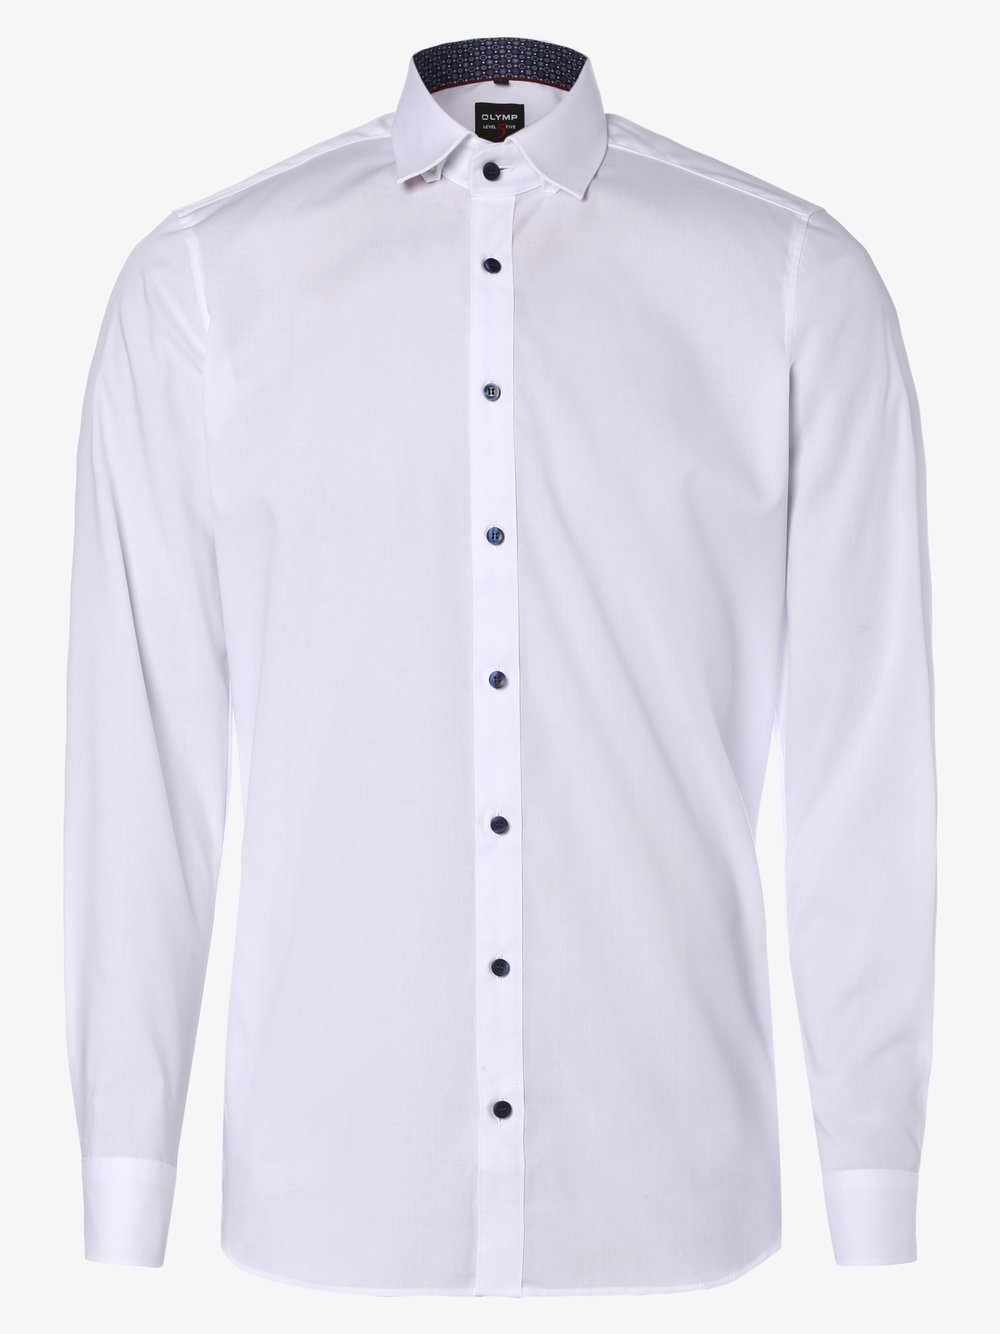 Olymp Level Five – Koszula męska łatwa w prasowaniu, biały Van Graaf 447913-0001